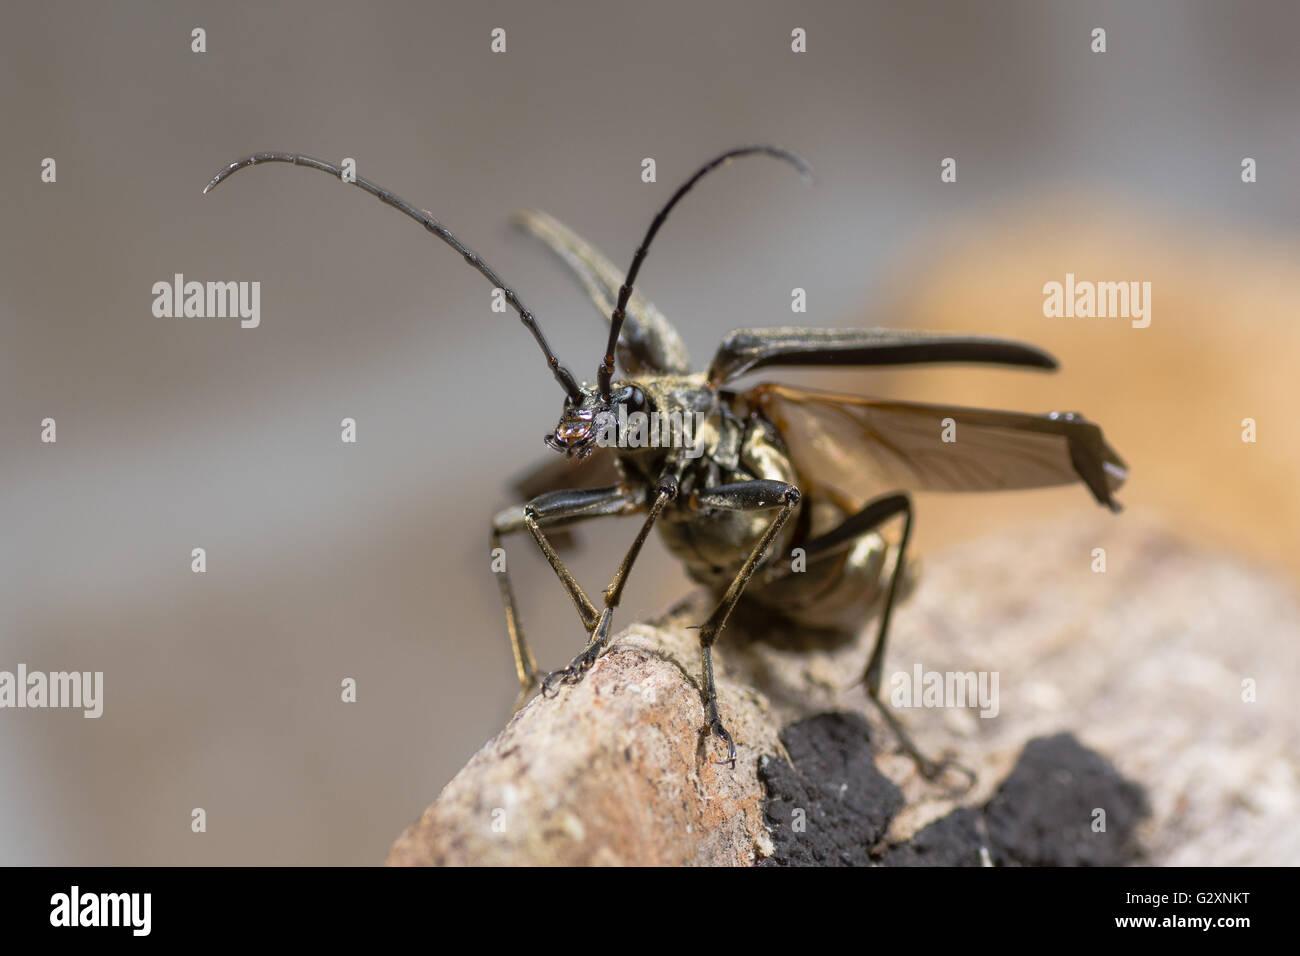 Stenocorus meridianus longhorn beetle taking flight. Insect in family Cerambycidae the longhorns or longicorn beetles Stock Photo